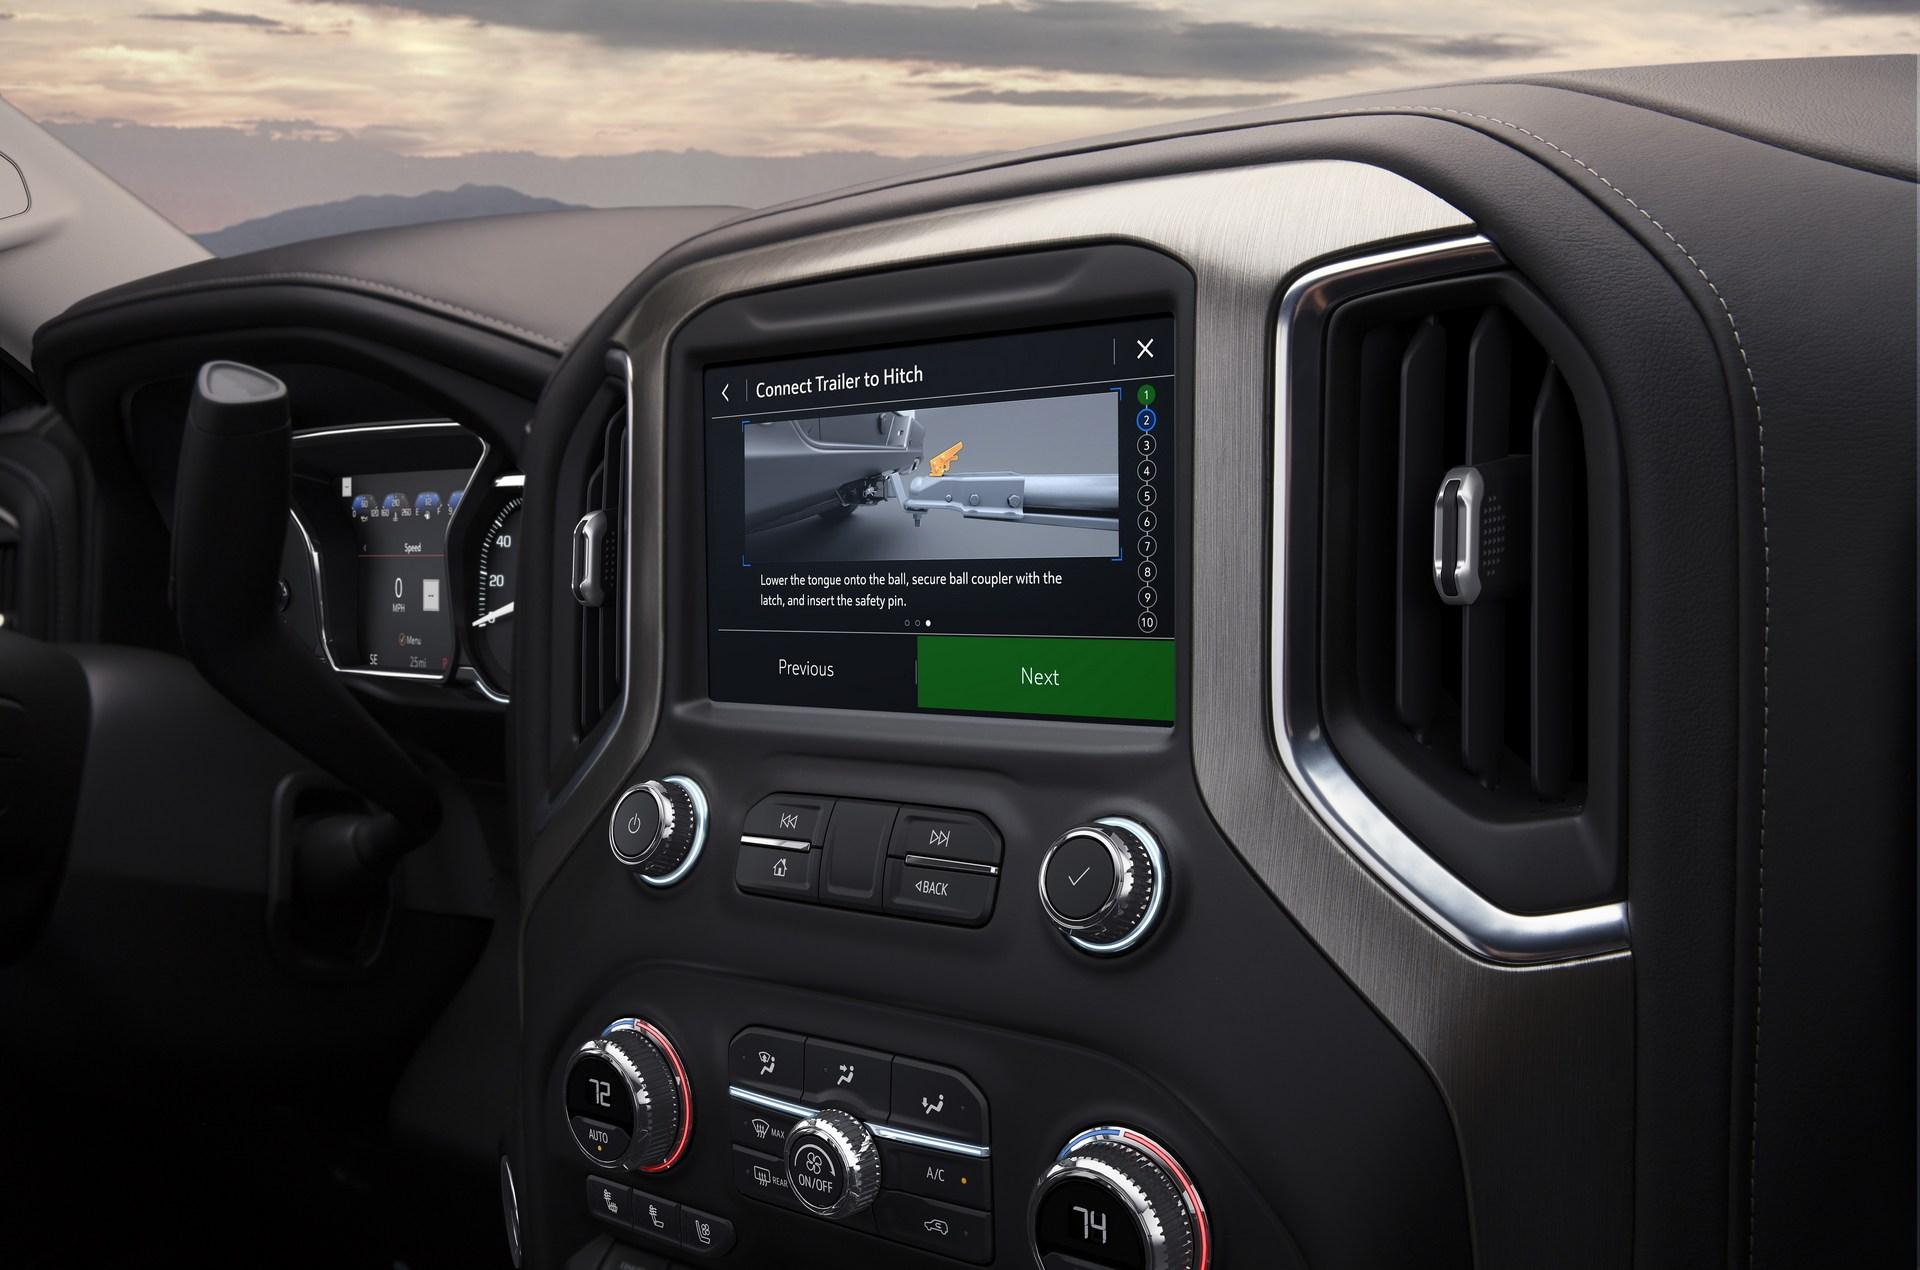 2019 GMC Sierra Denali ProGrade Trailering System